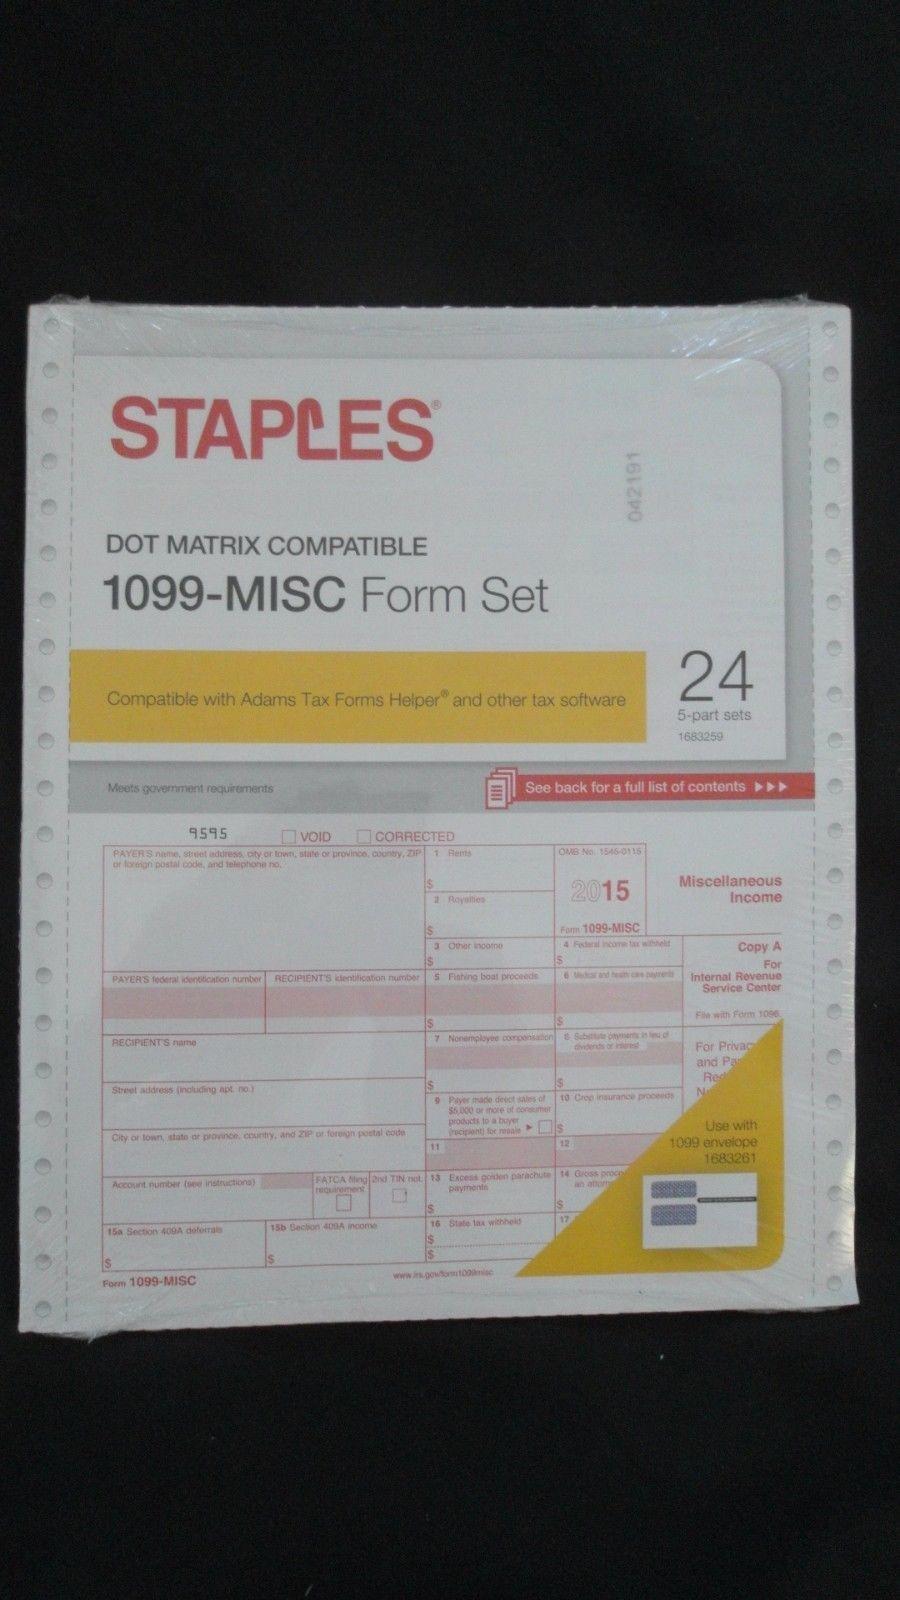 Tax Forms Helper Staples